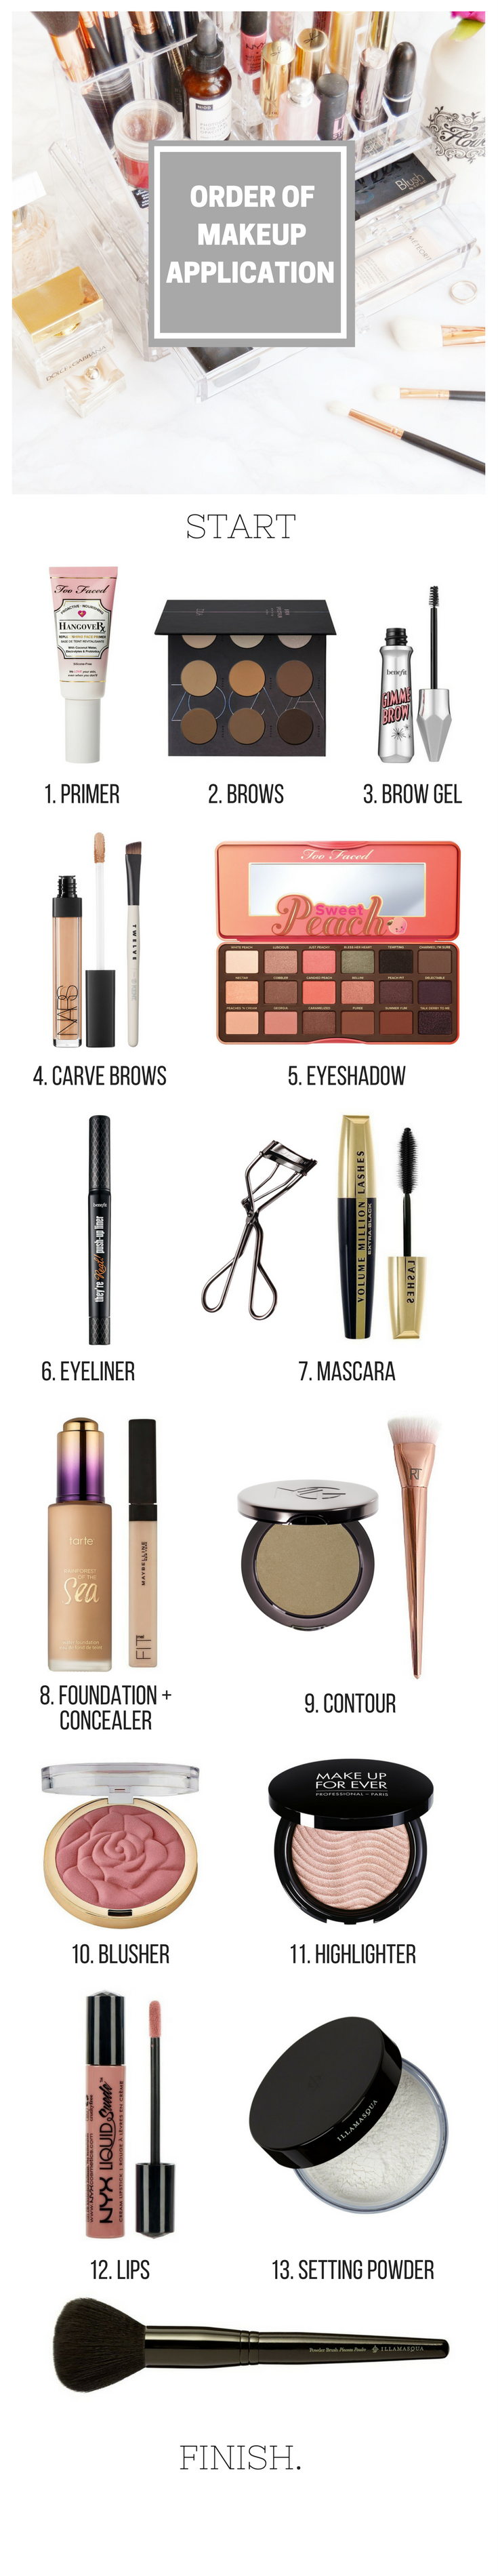 The Order of Makeup Application Pinterest Stuff I Love